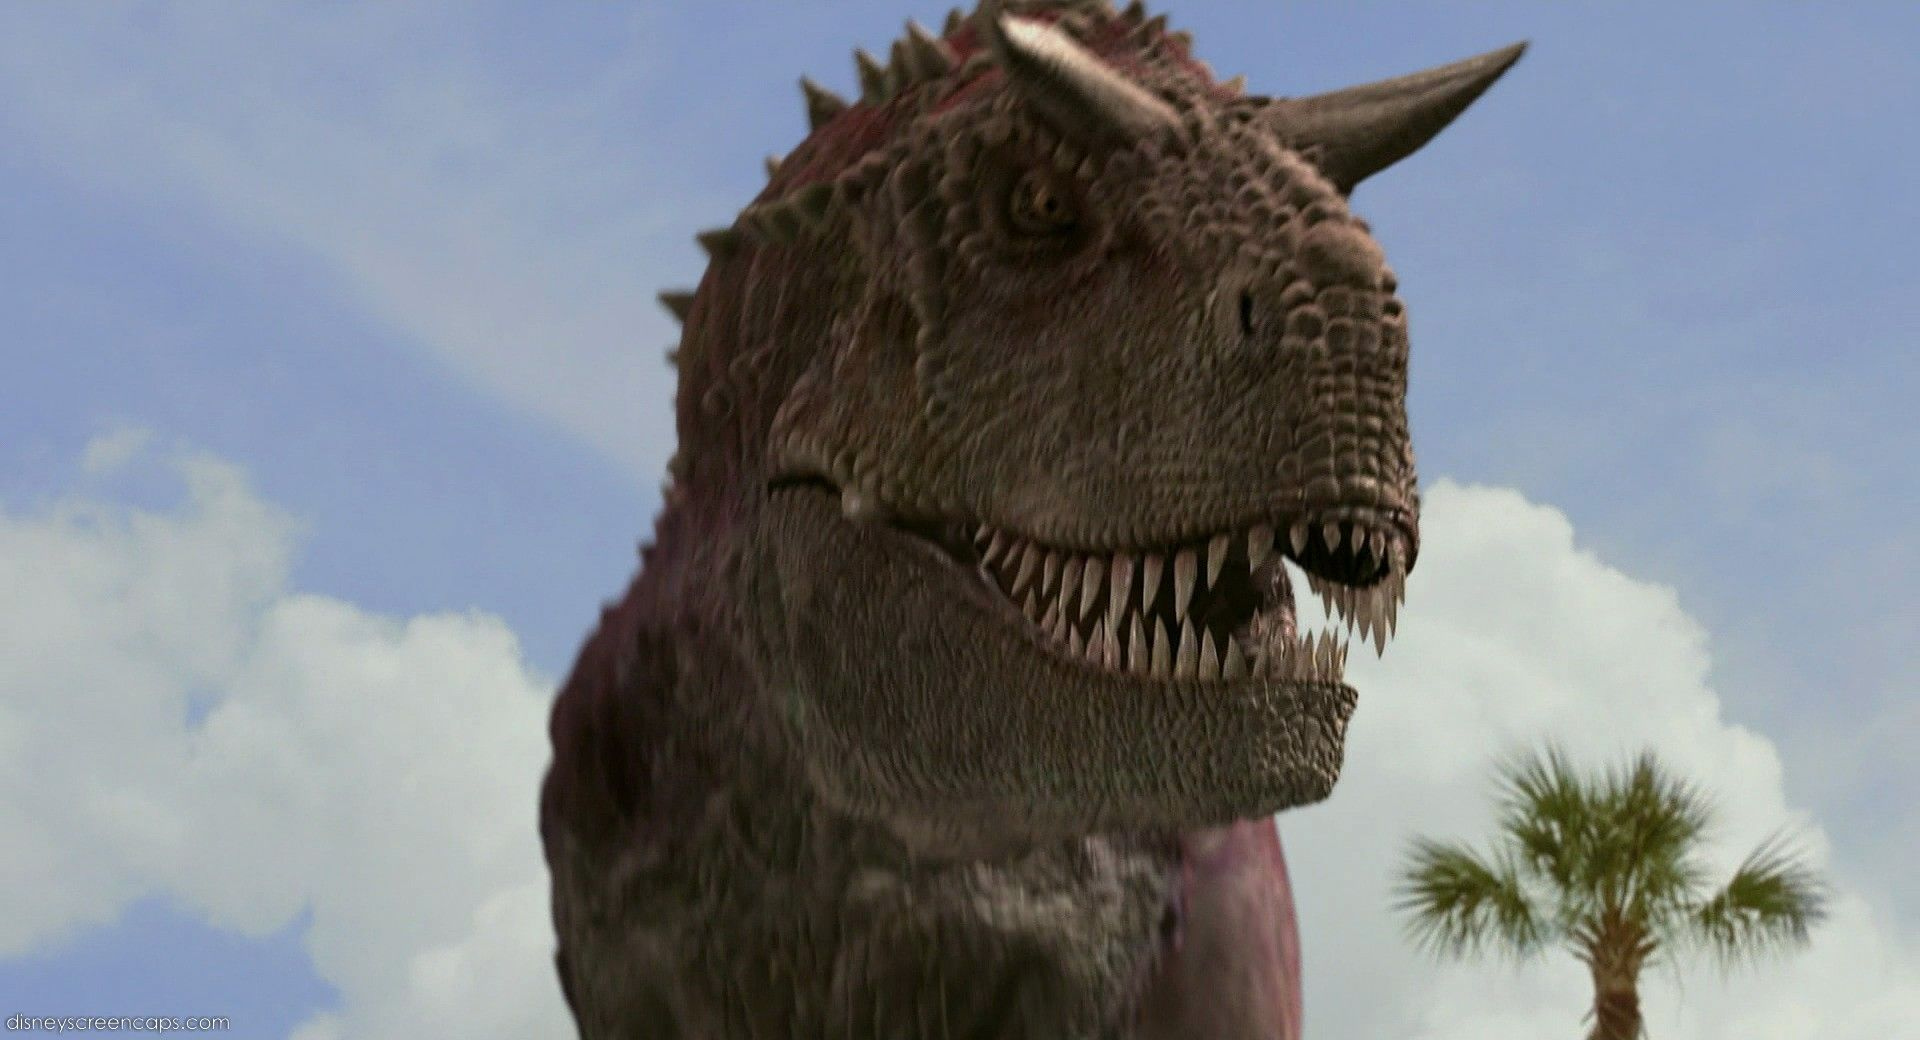 Dinosaur disneyscreencaps com 1920 1040 - Dinosaure film gratuit ...